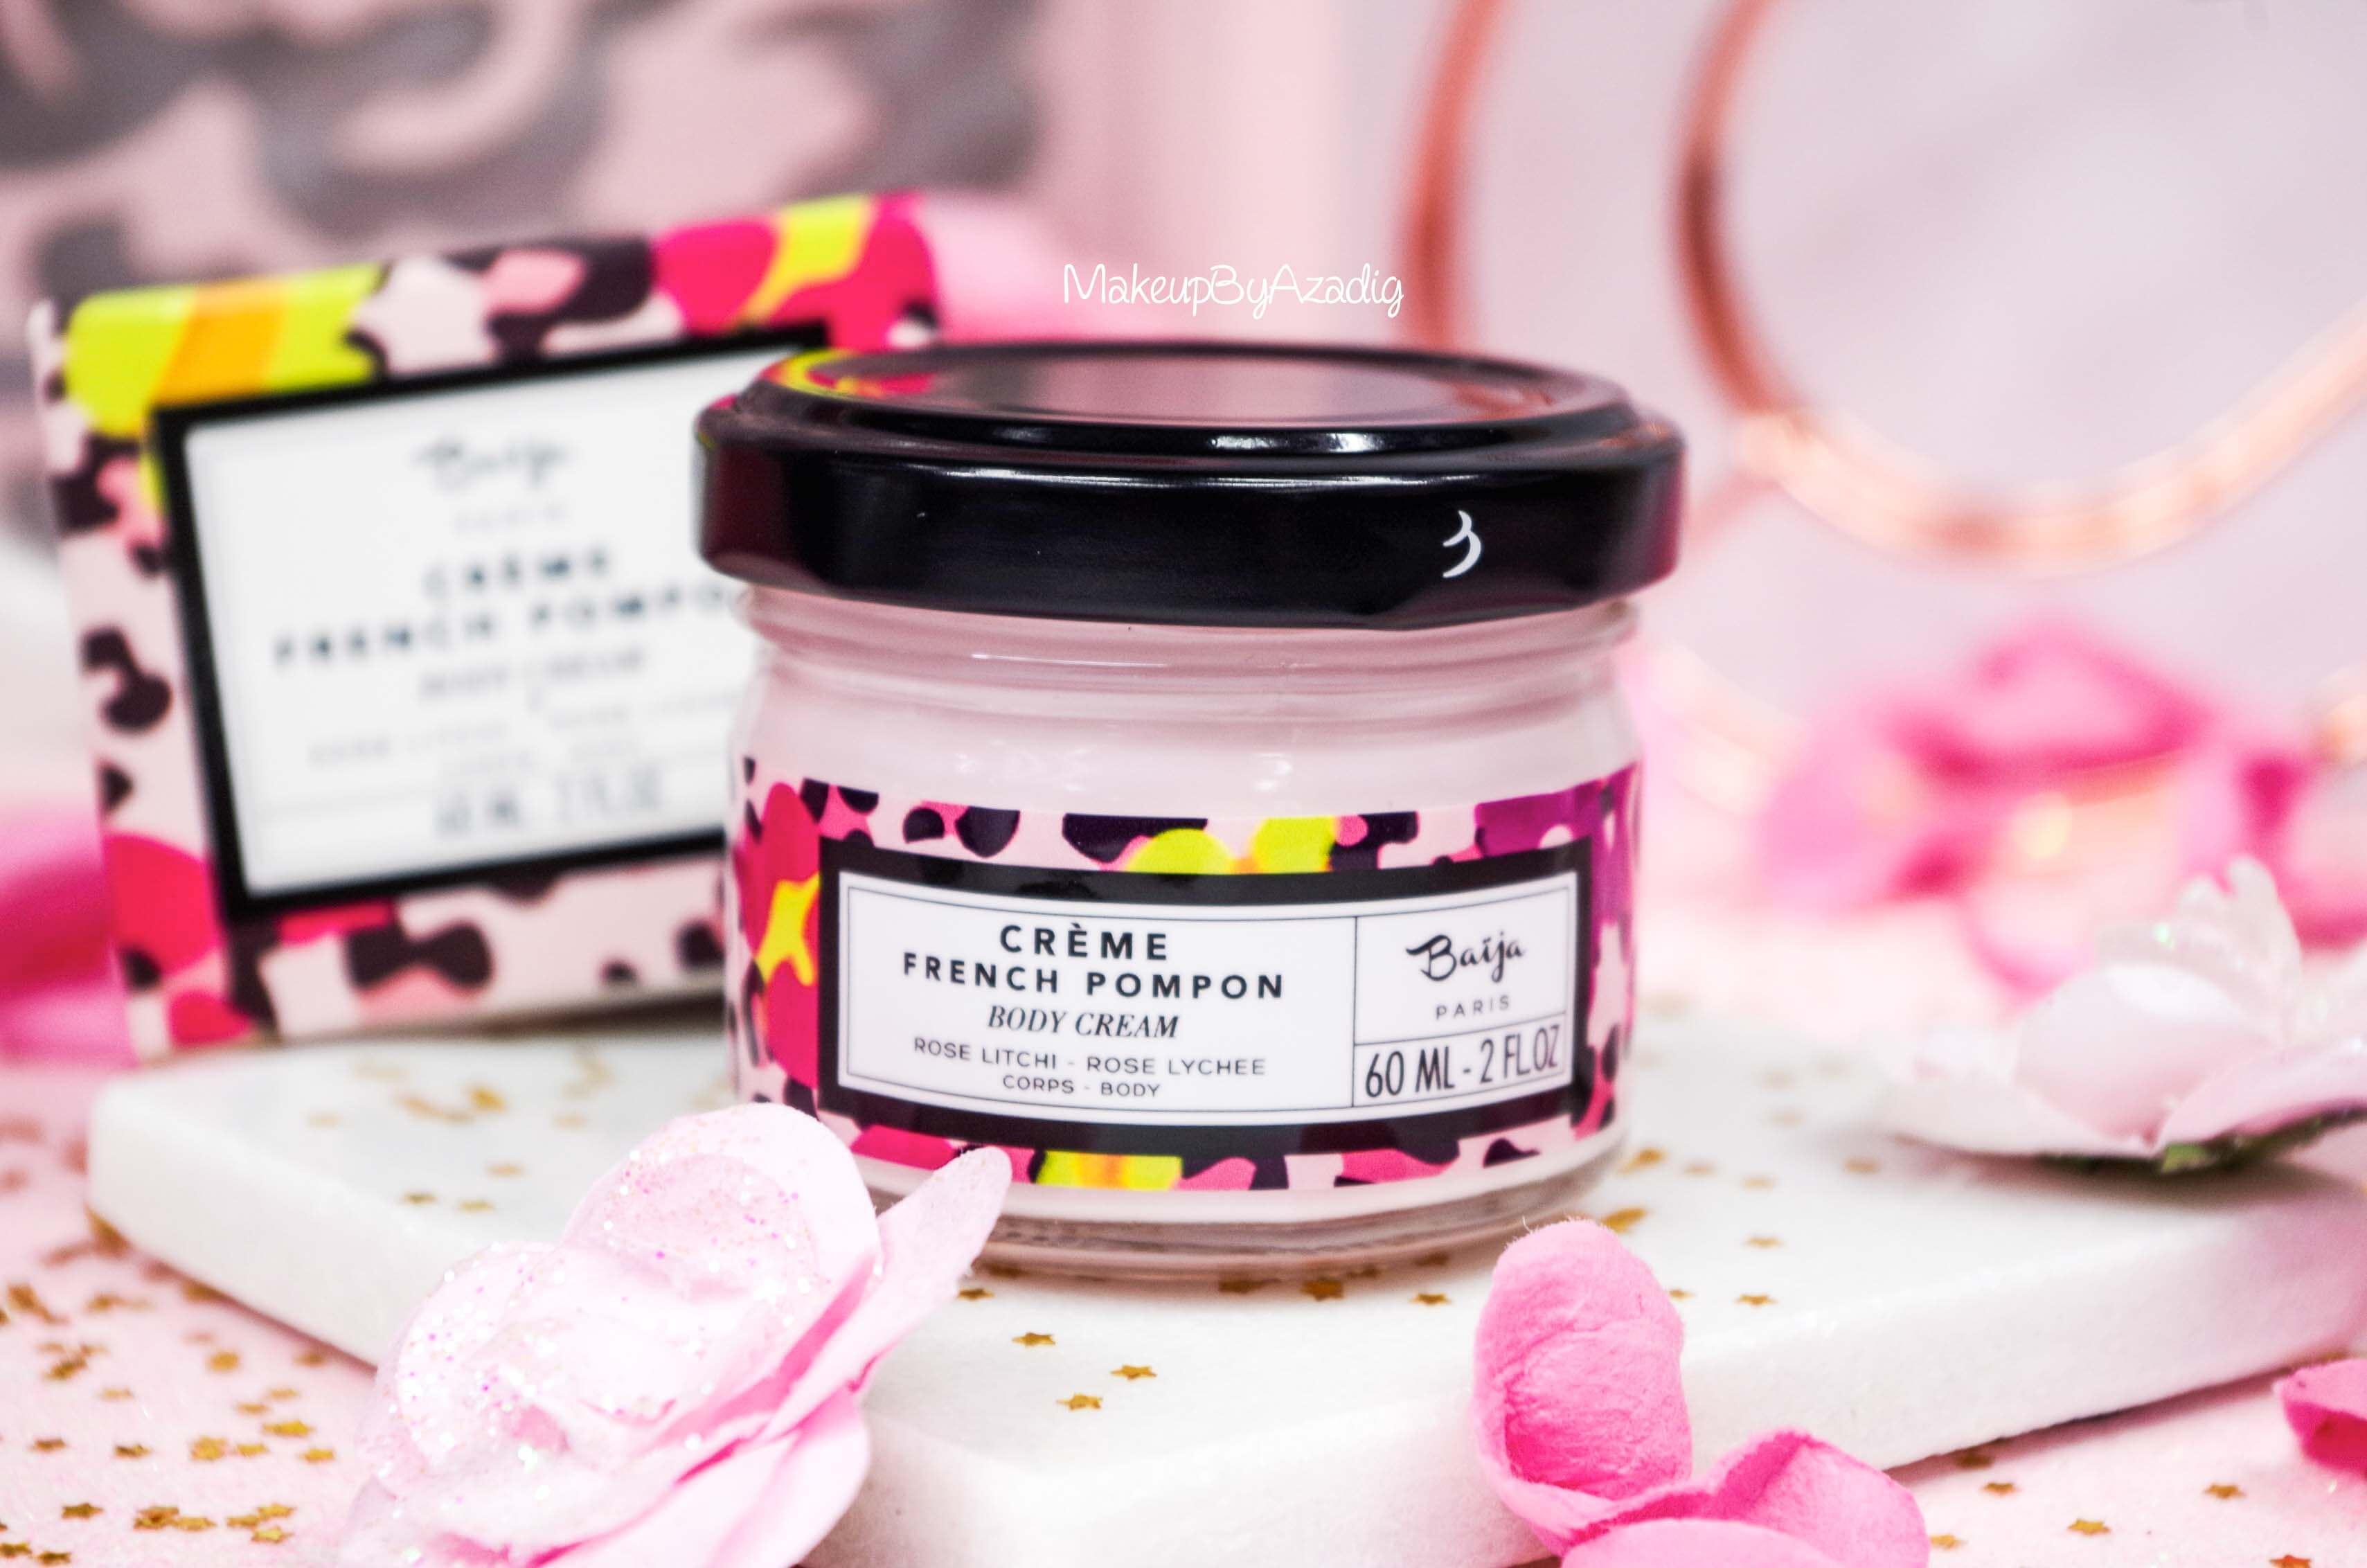 creme-corps-cream-body-french-pompon-baija-rose-litchi-sephora-makeupbyazadig-revue-prix-avis-pot